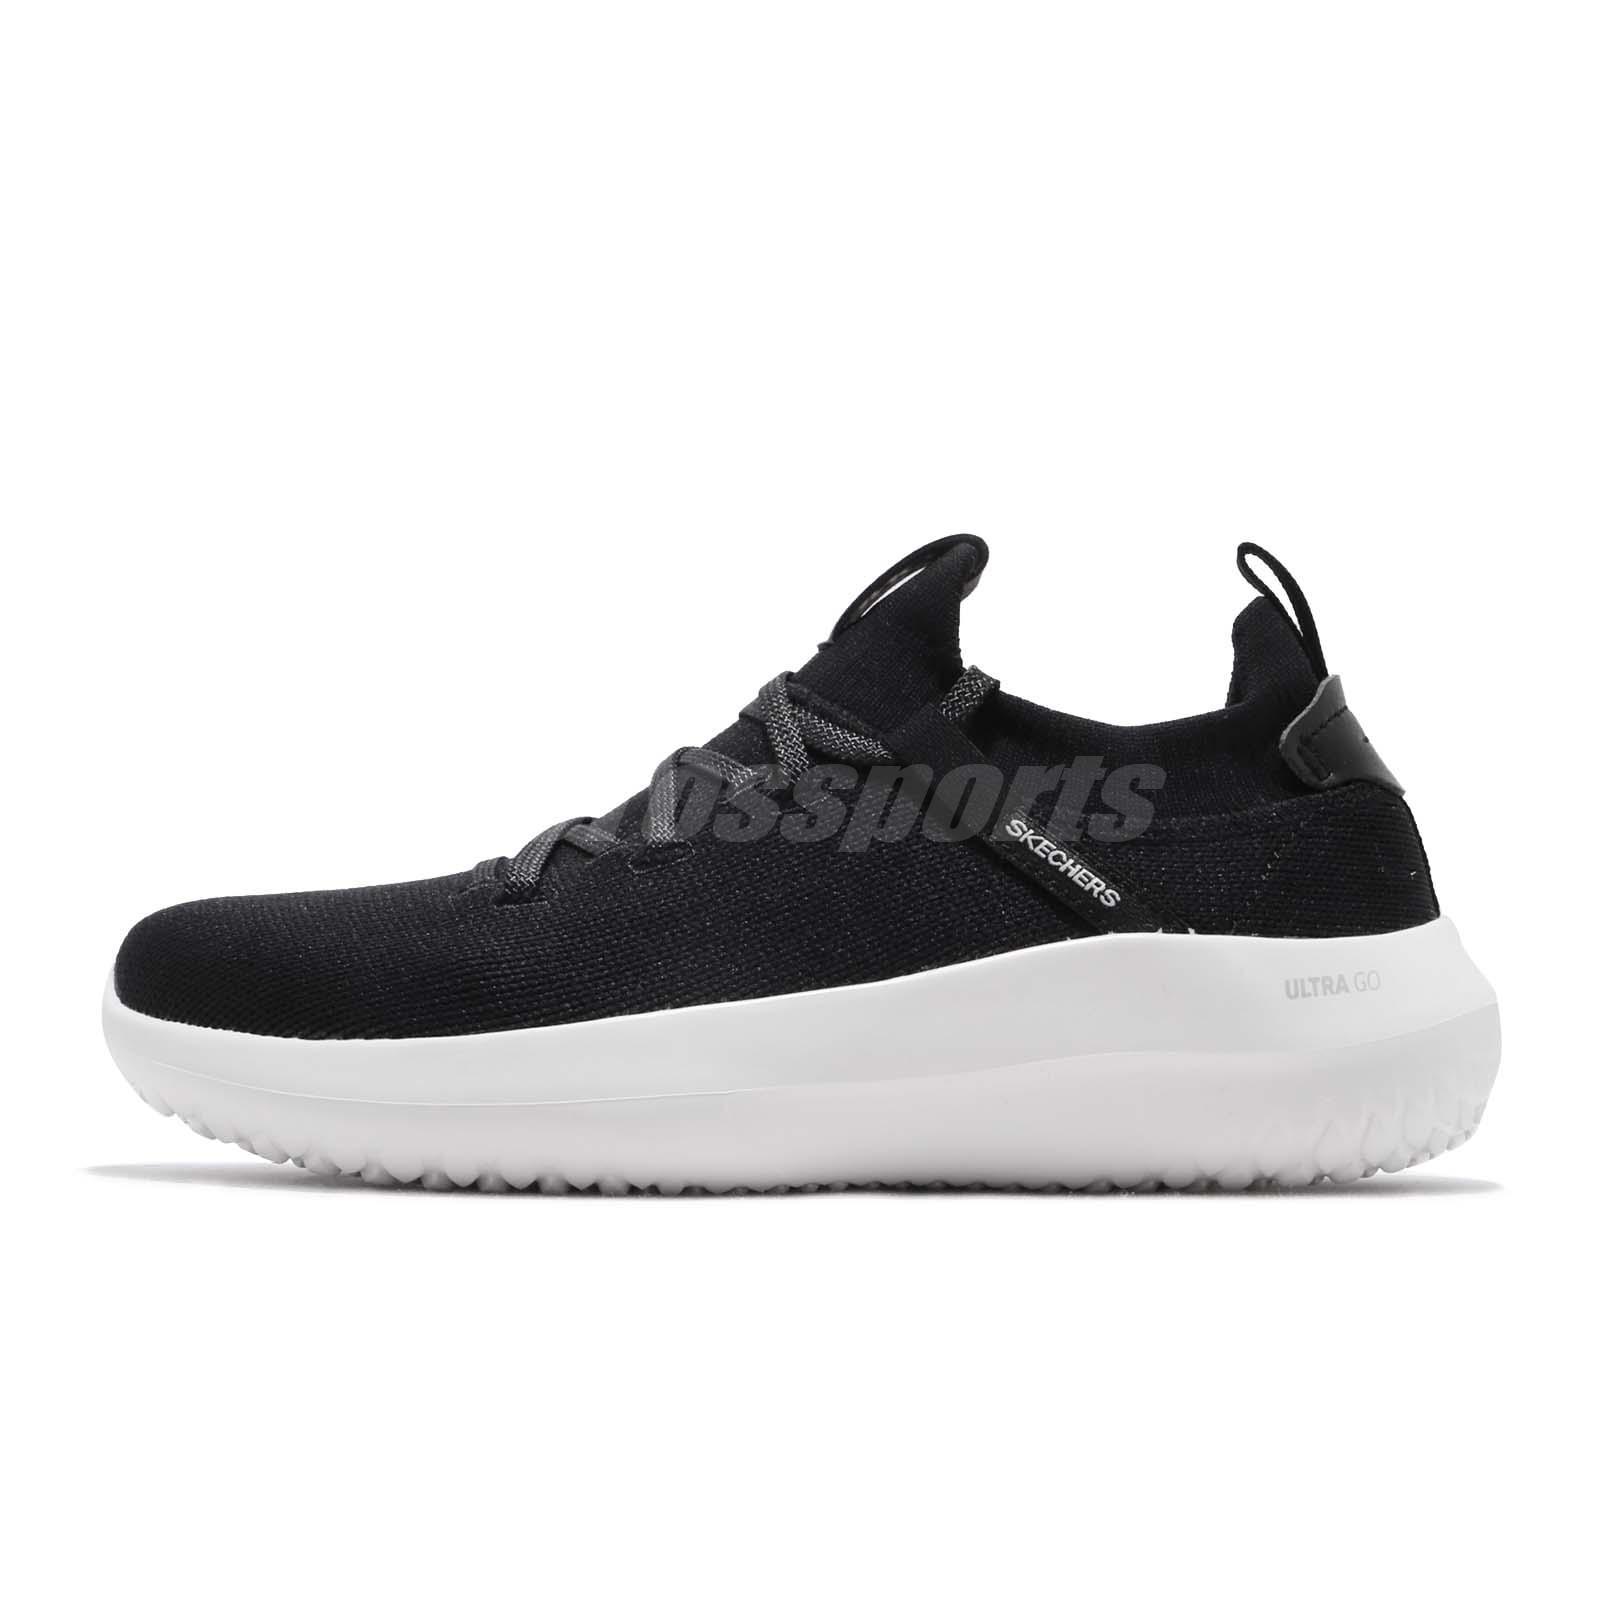 2dd79a32d48 Skechers Downtown Ultra-Core Black White Women Running Shoes Sneakers  18040-BKW